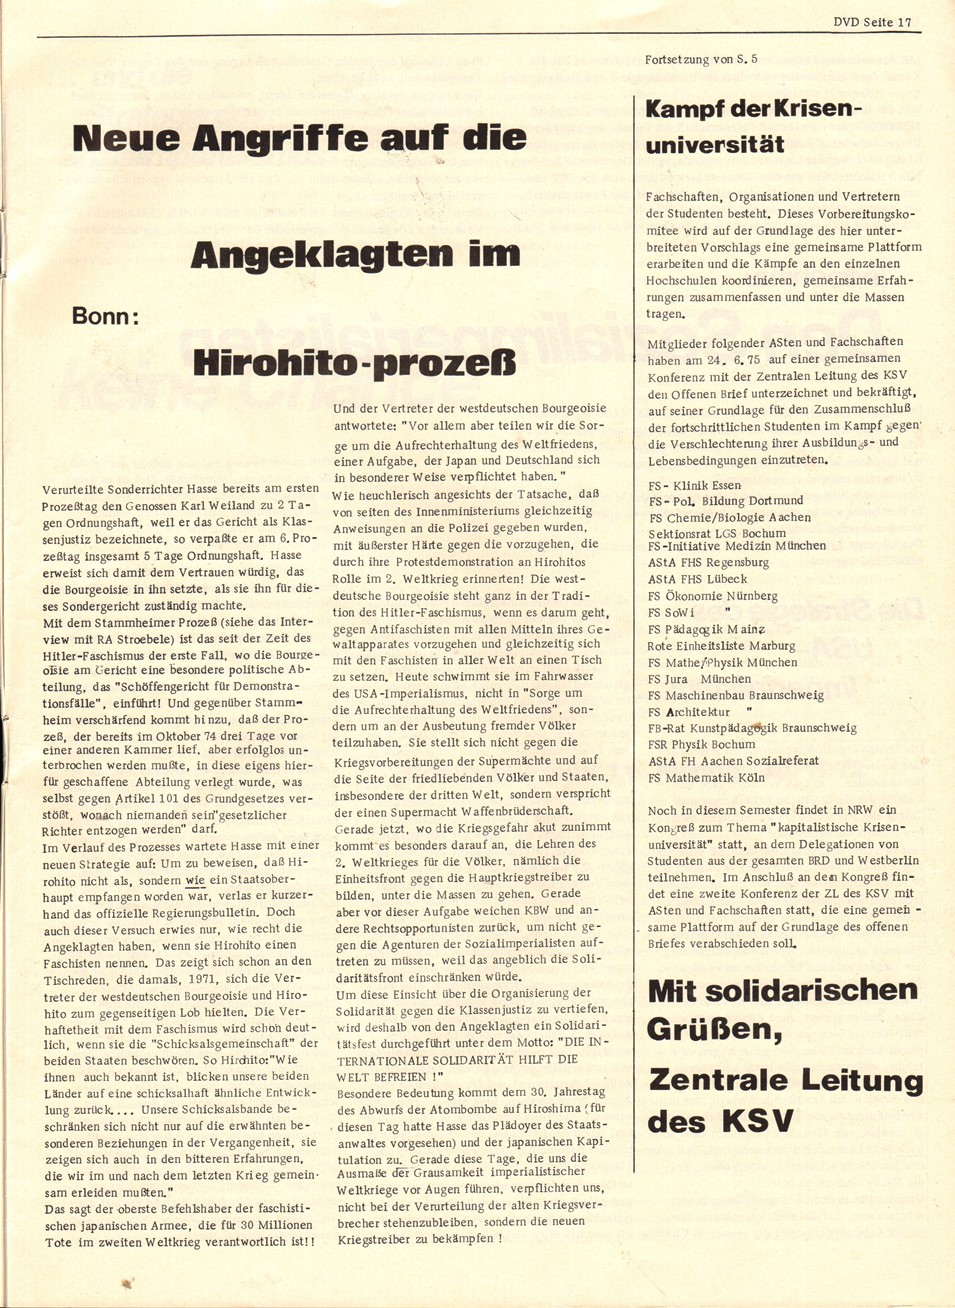 Koeln_KSV_DVD_19750625_17